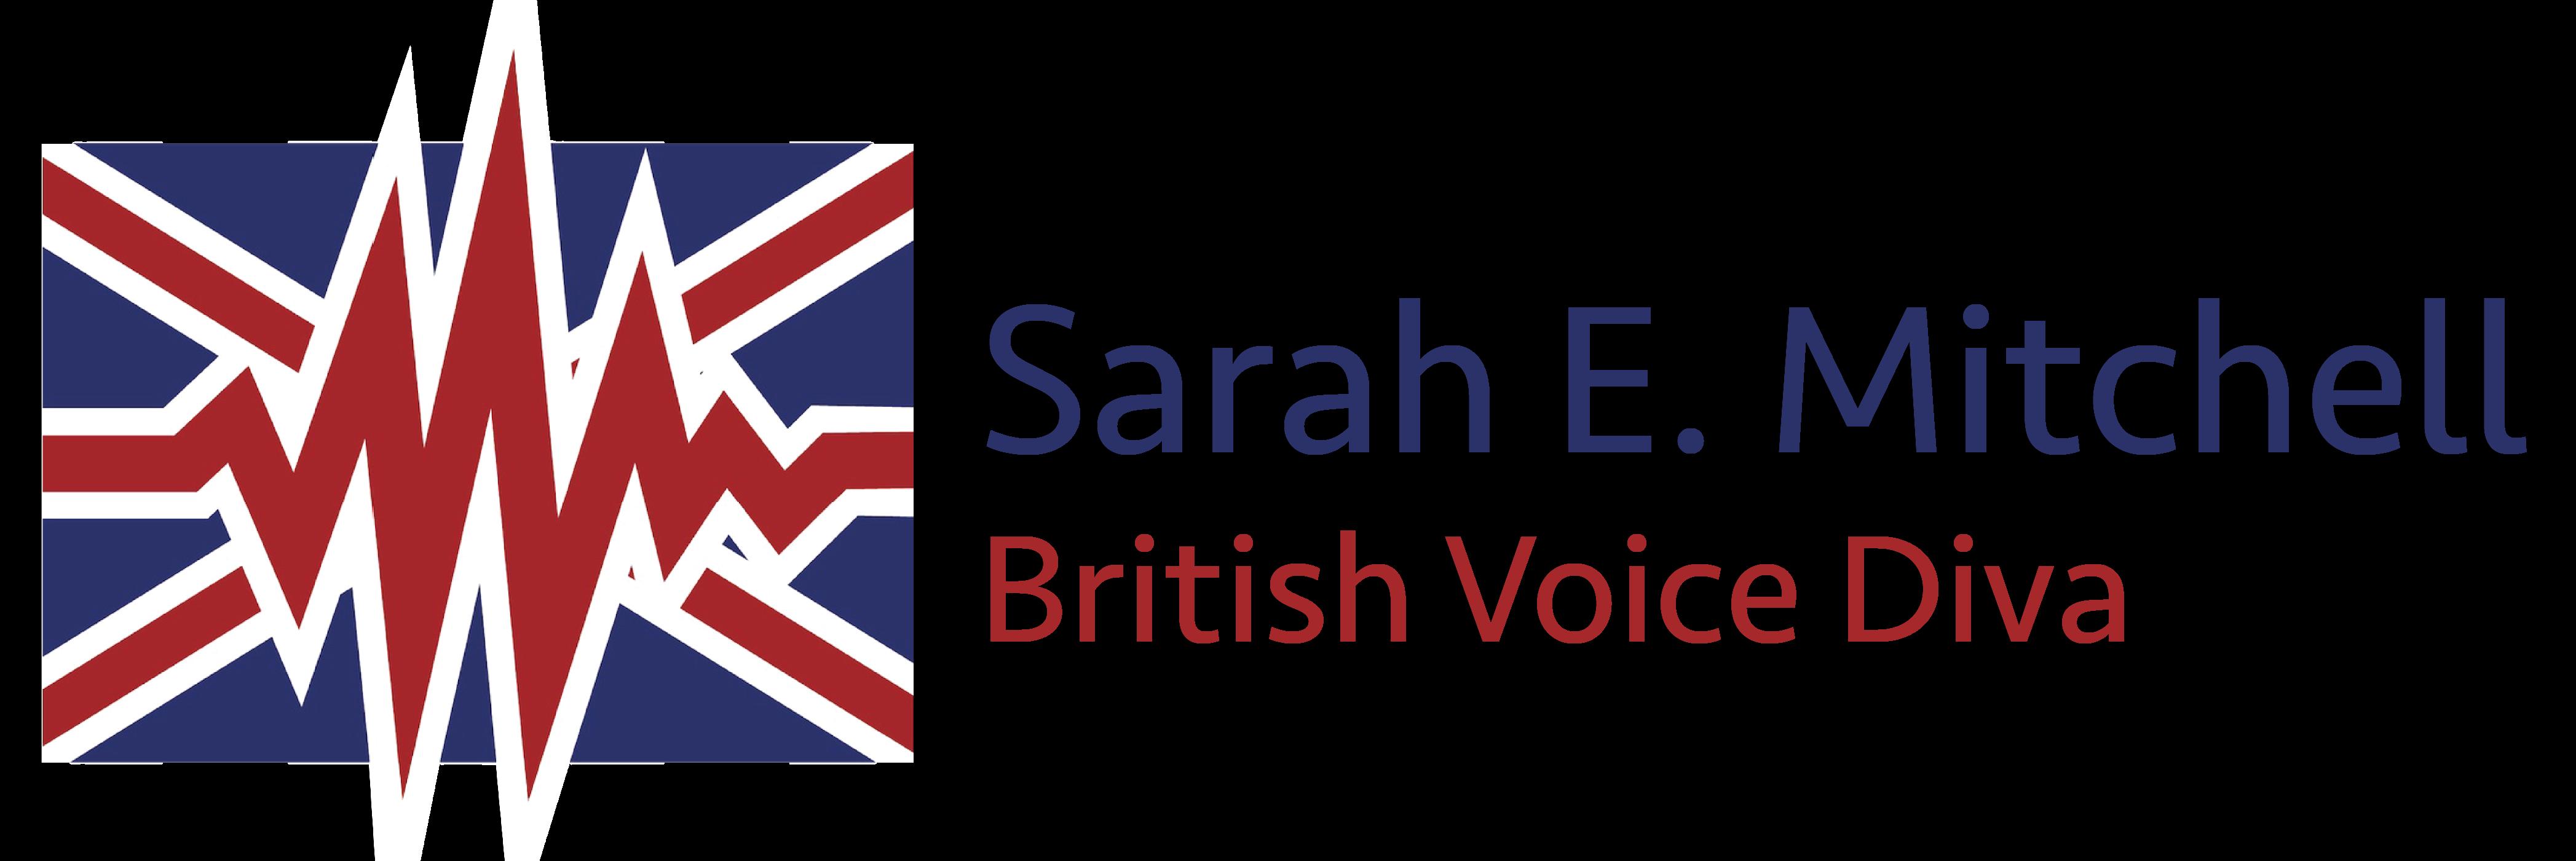 Sarah E. Mitchell